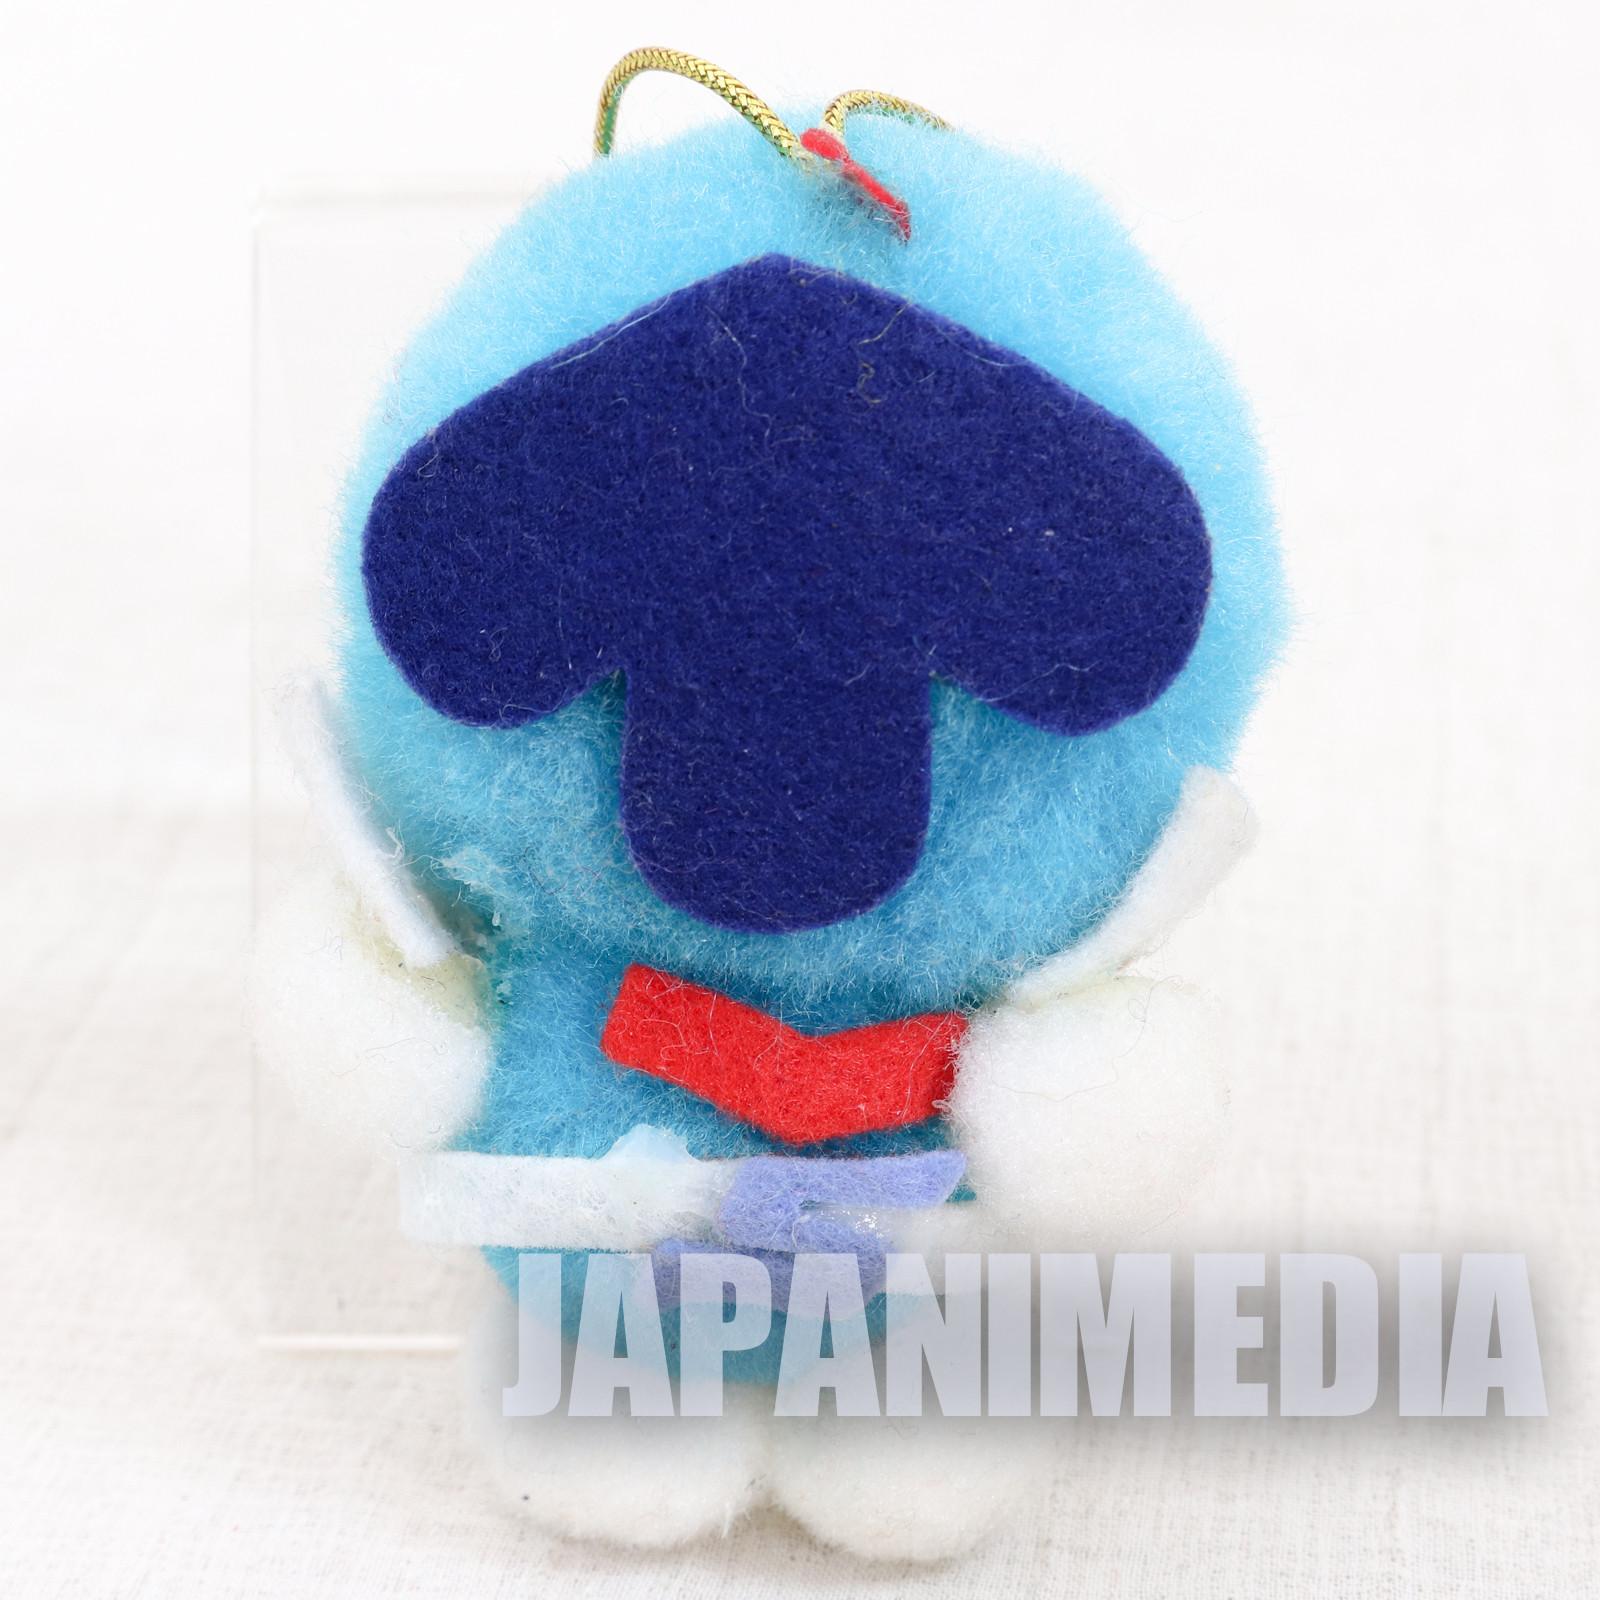 Retro RARE! Goranger Blue Aoranger Small Size Plush Doll JAPAN TOKUSATSU